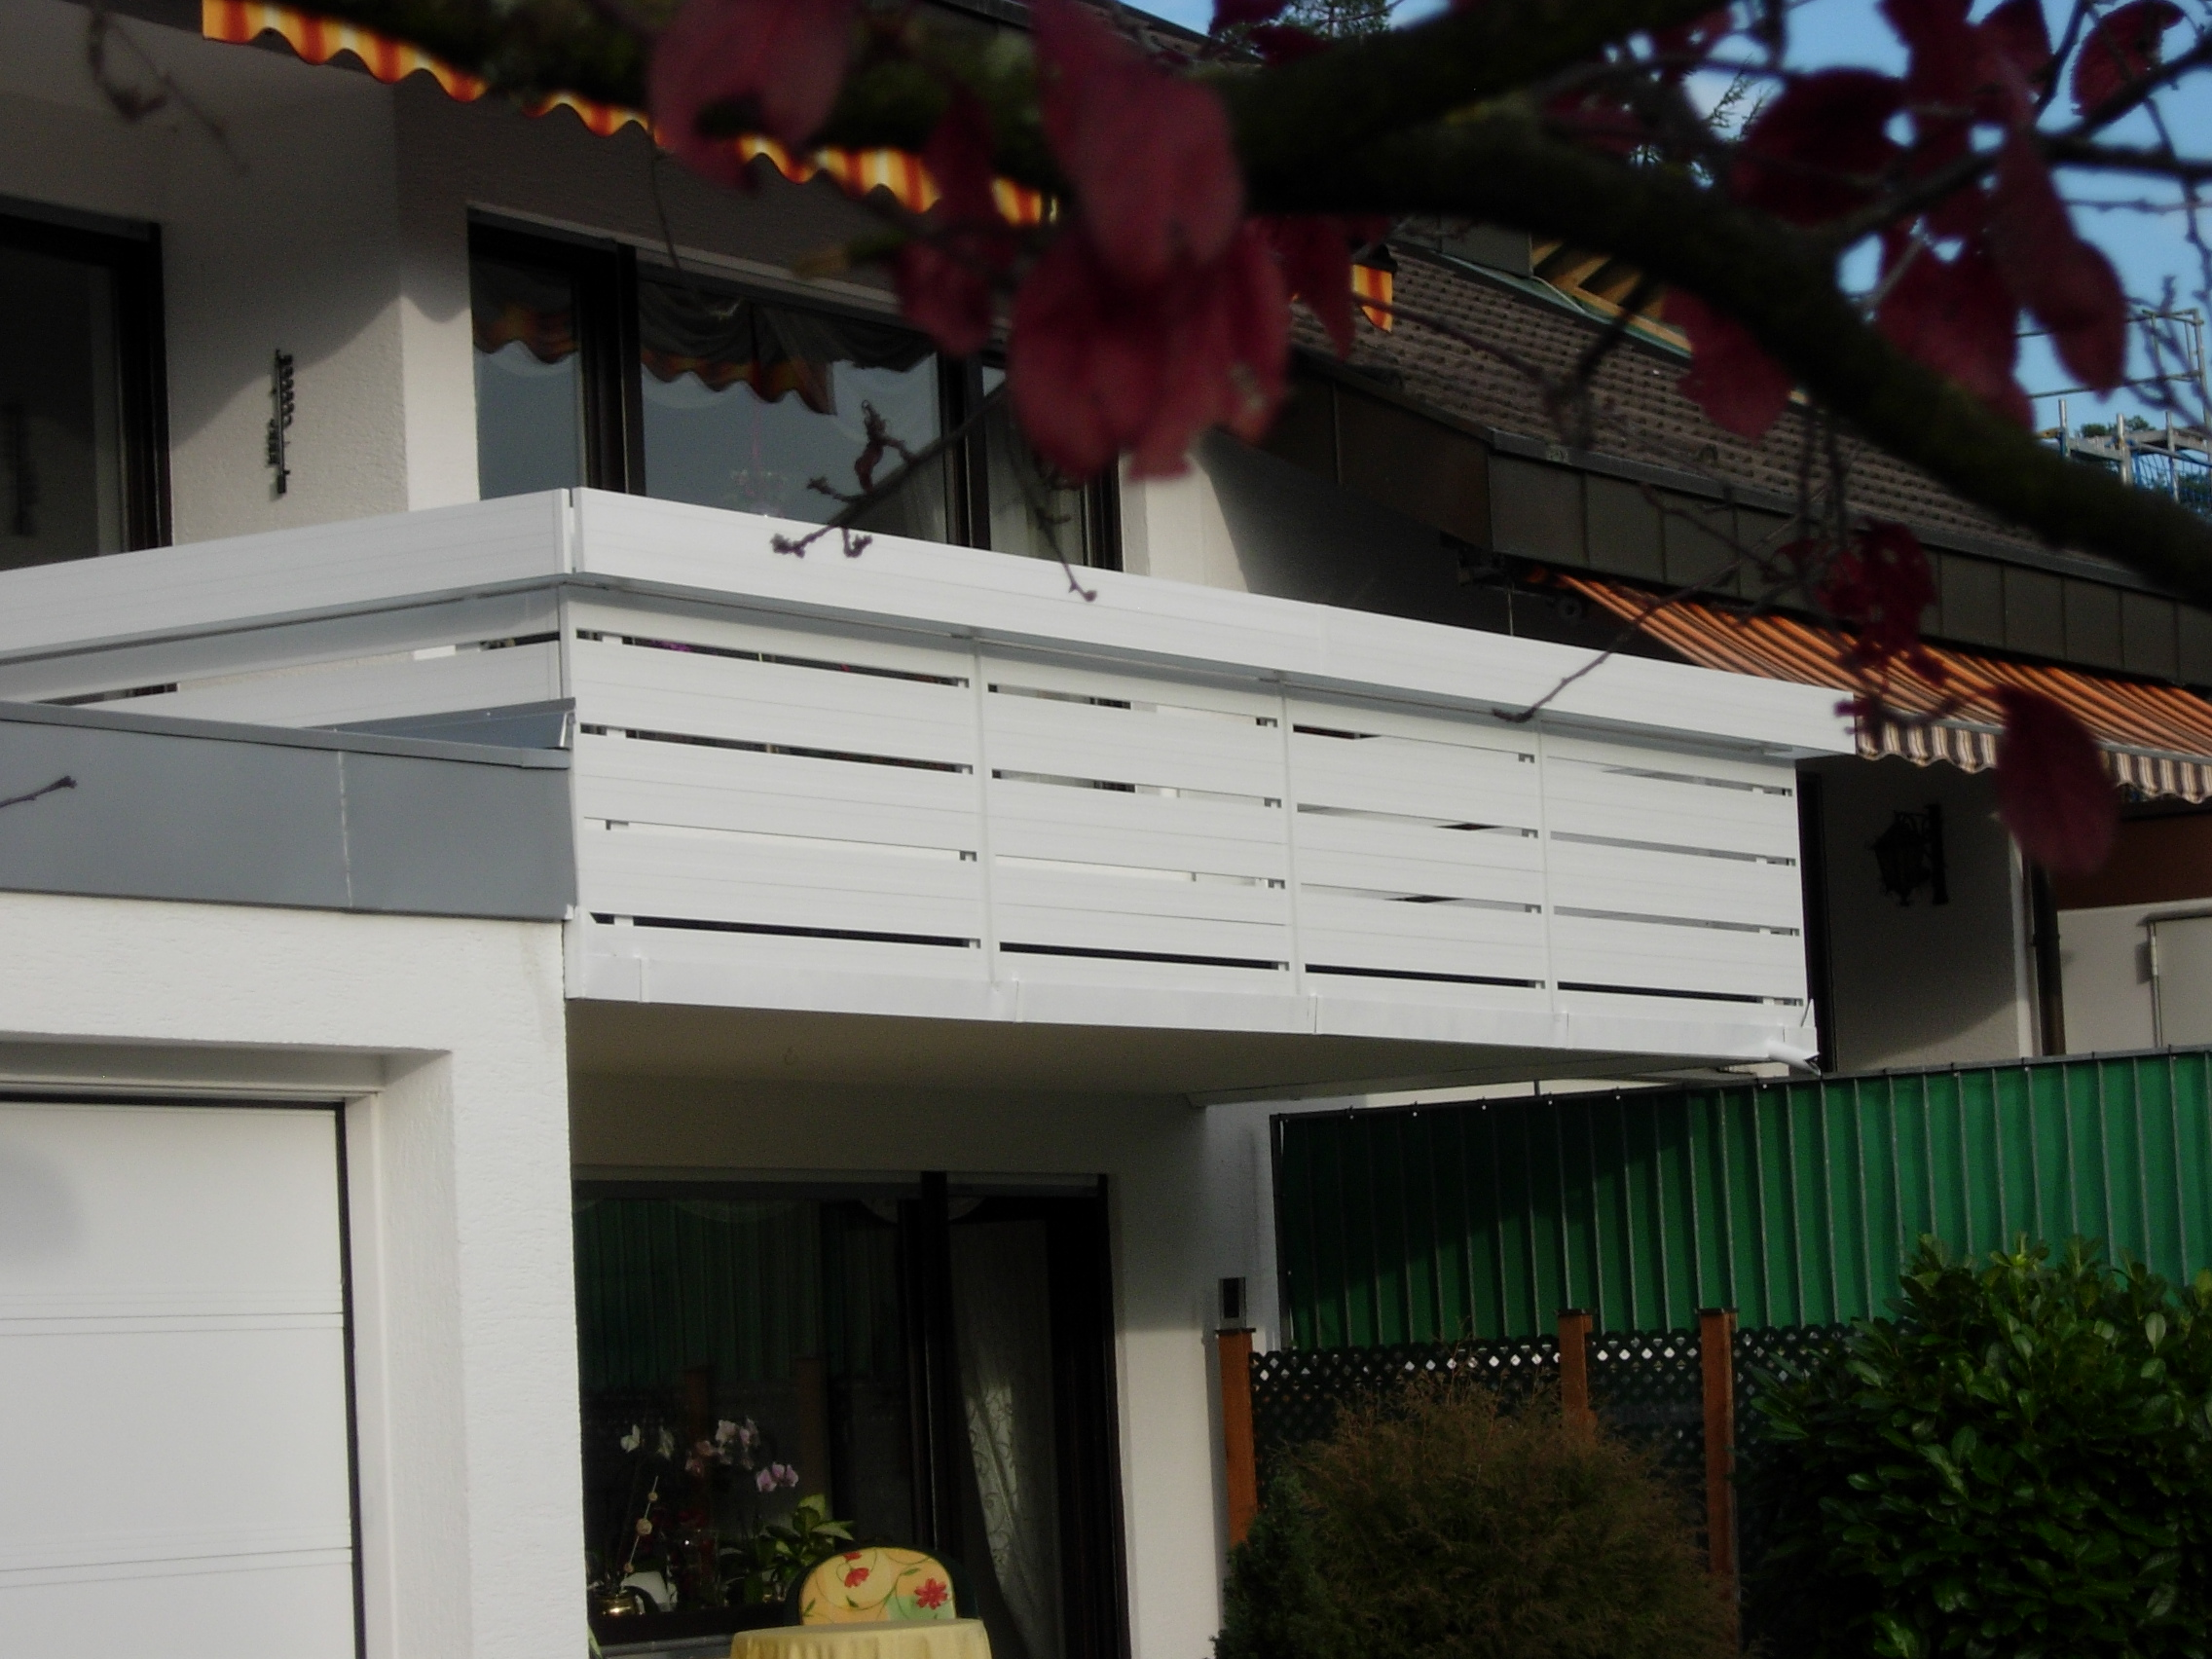 Blumenbrett und neue Balkonmodule aus Aluminium.